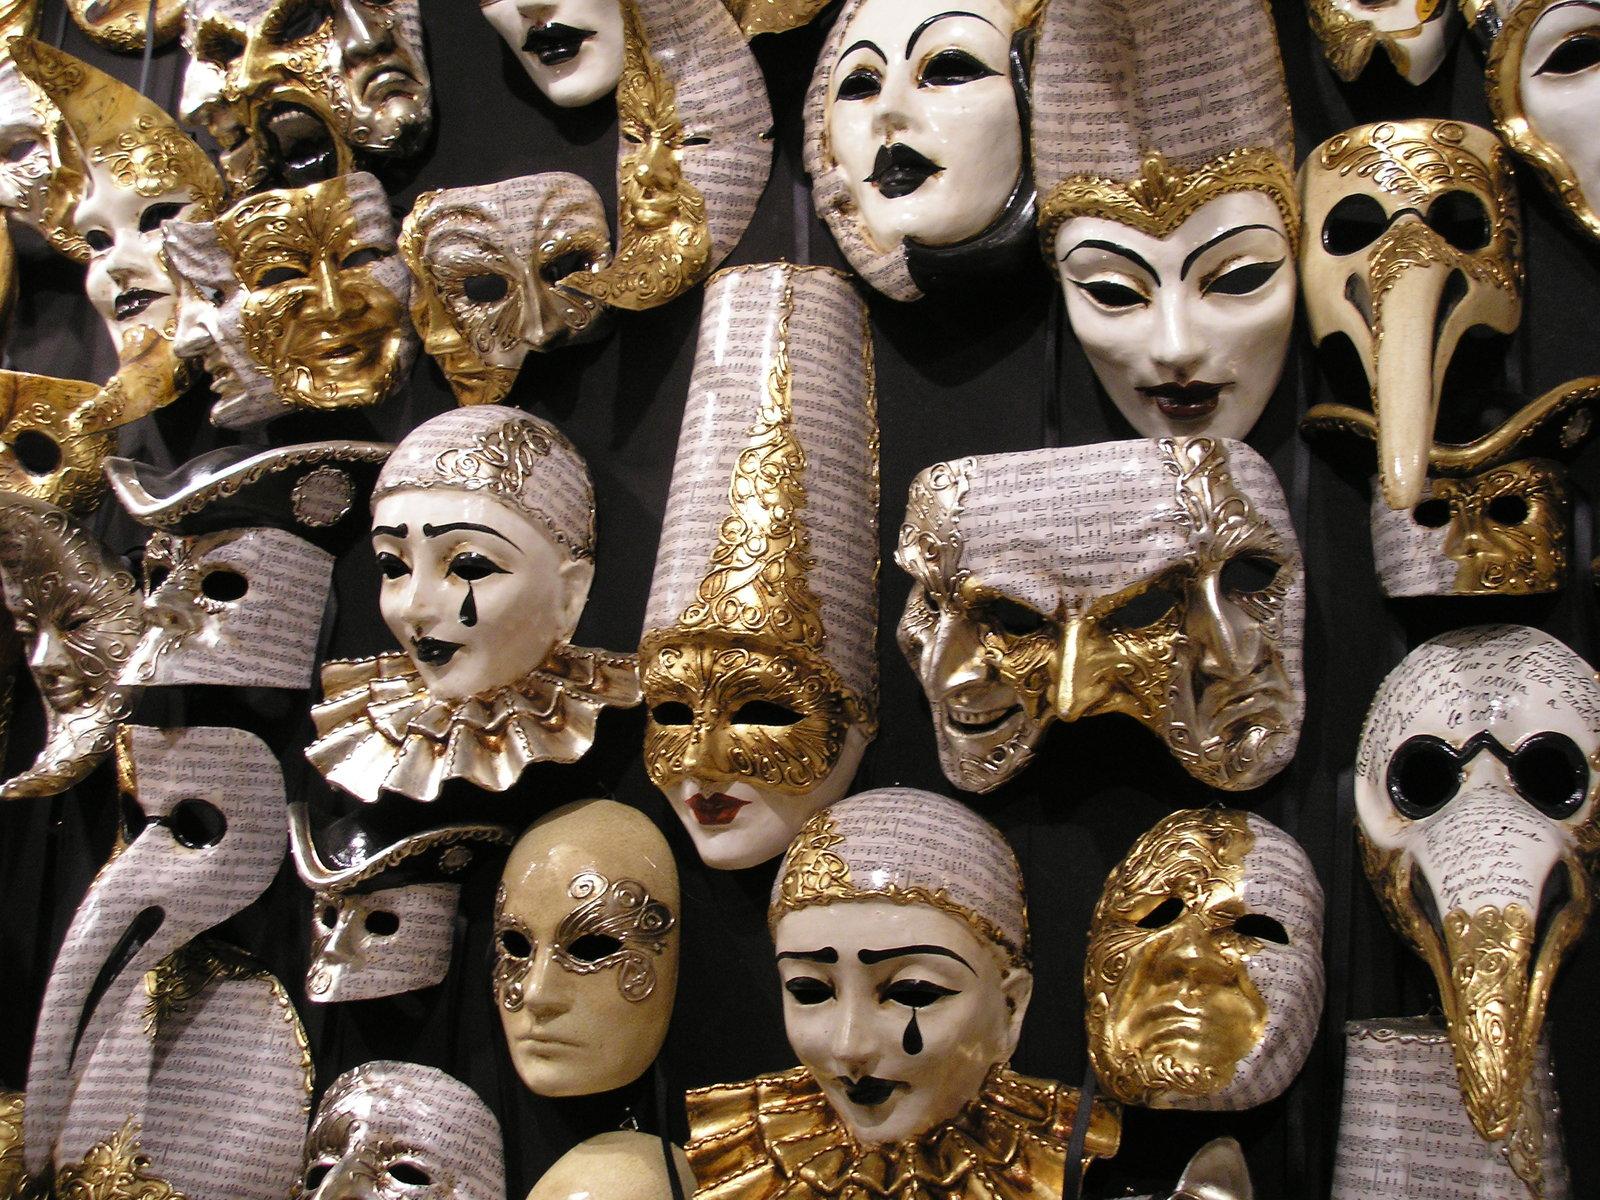 Venetian masks for Halloween costume ideas